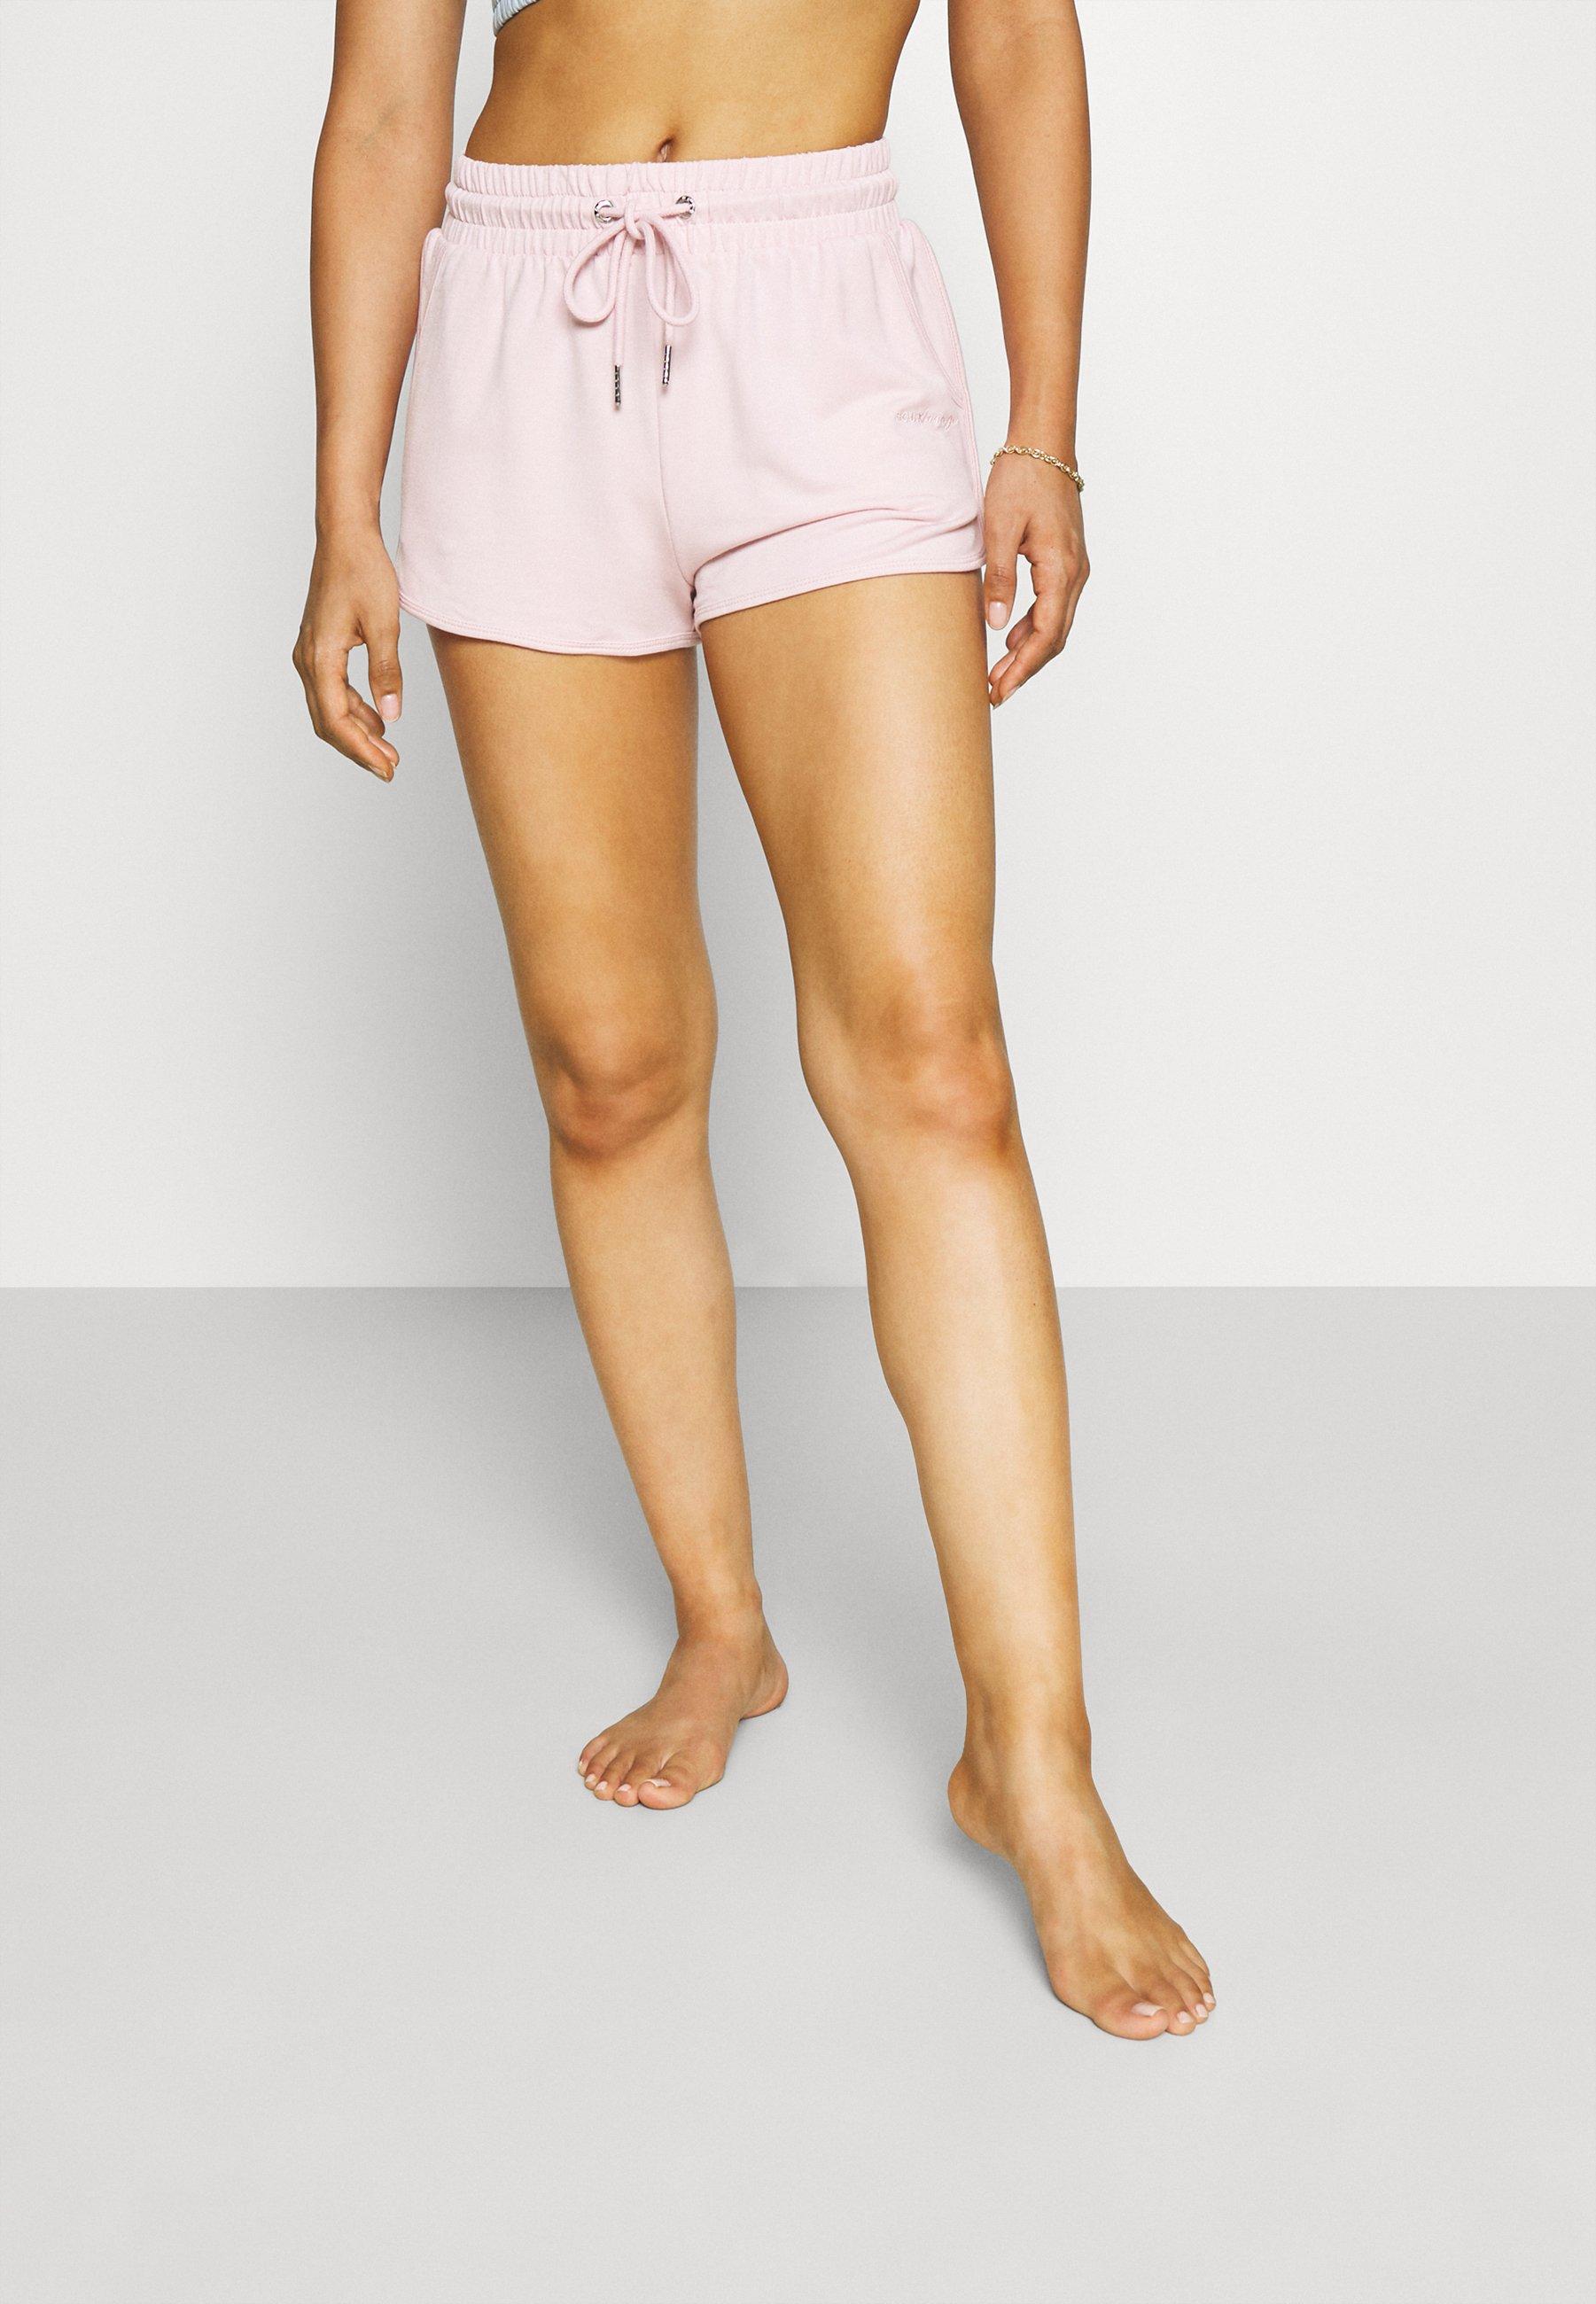 Donna MILA LOUNGE SHORT - Pantaloni del pigiama